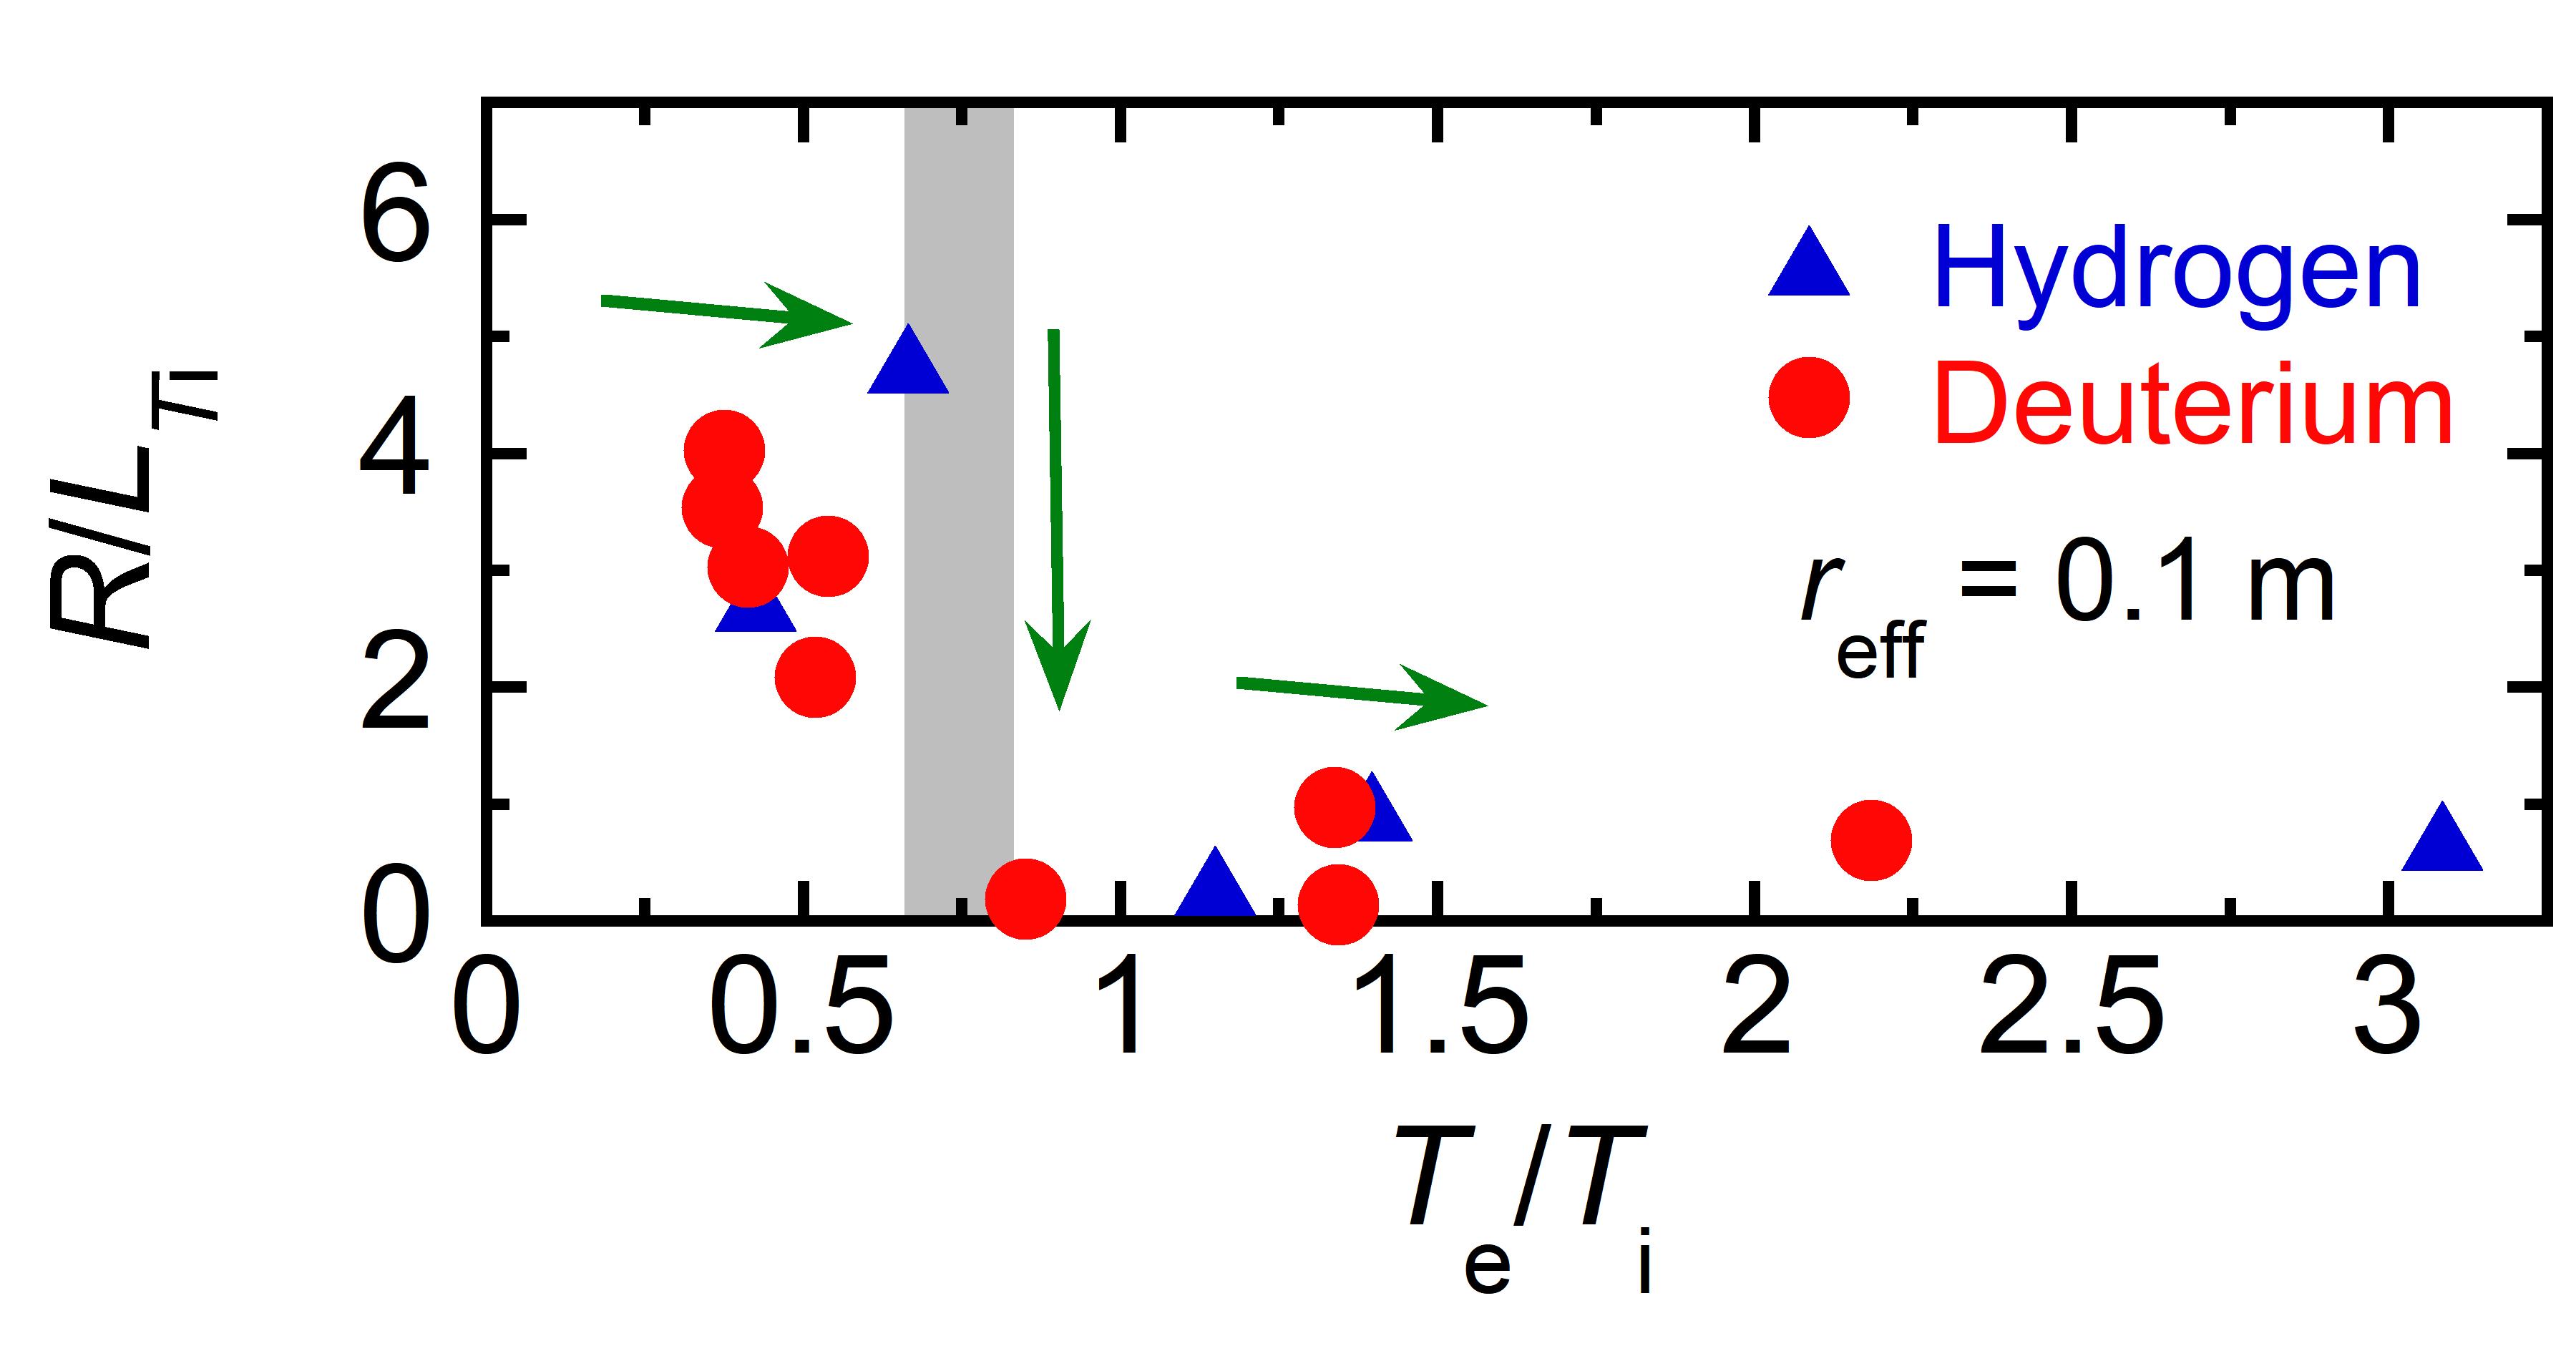 The dependence of the $R/L_{Ti}$ on the $T_e$/$T_i$ at $r_{eff}$ = 0.1 m.